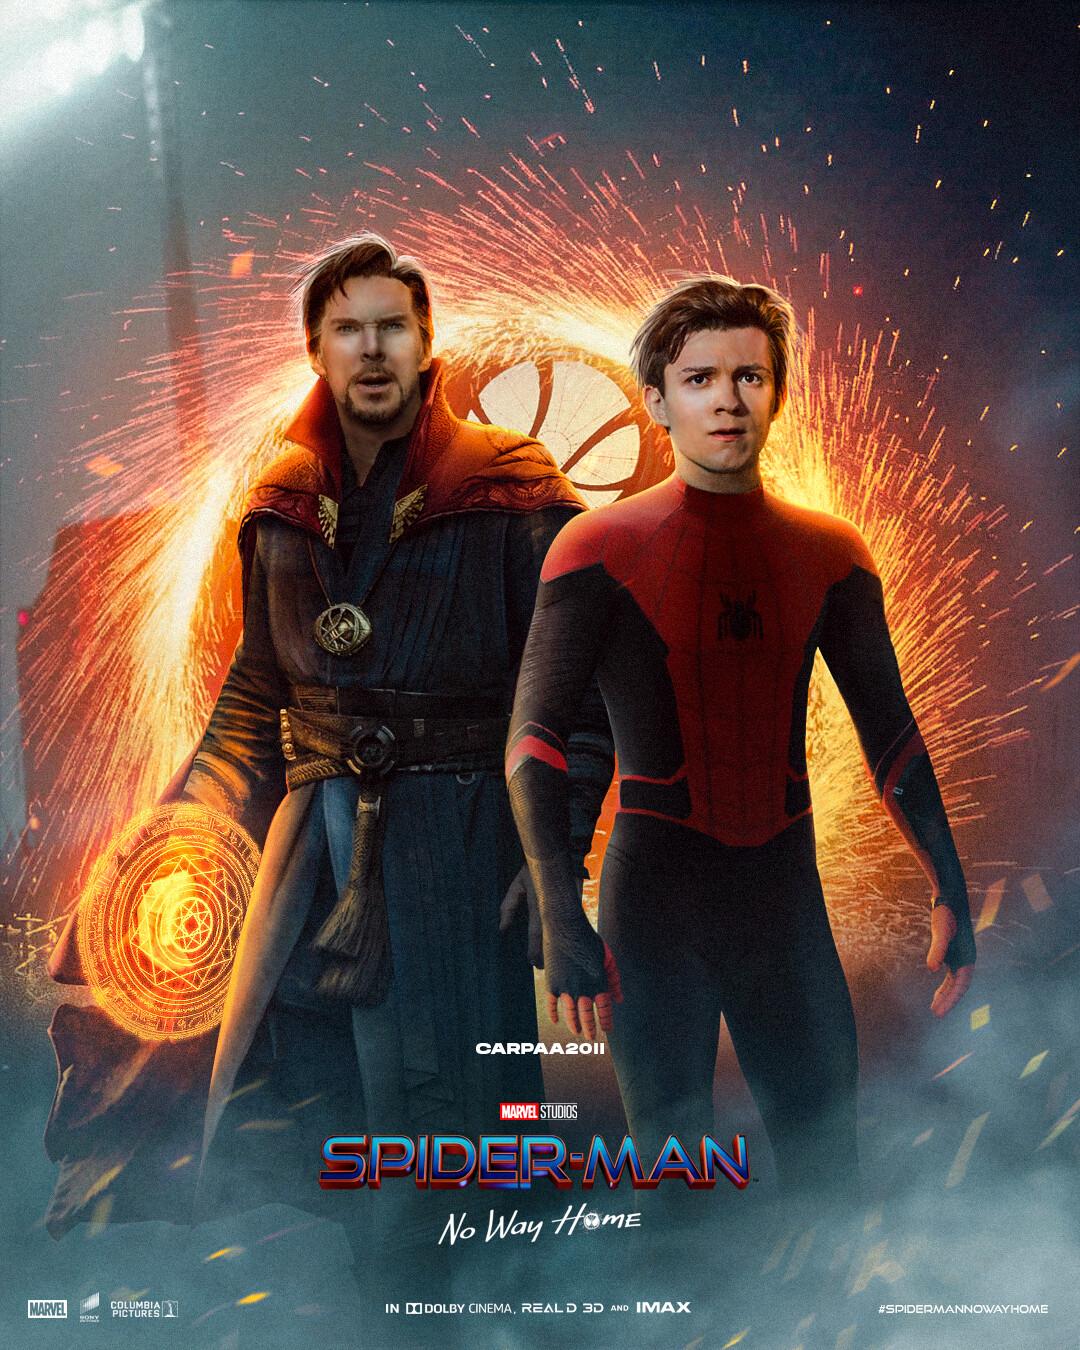 SPIDER MAN – NO WAY HOME 2021 Official Hindi Teaser Trailer 1080p HDRip Download